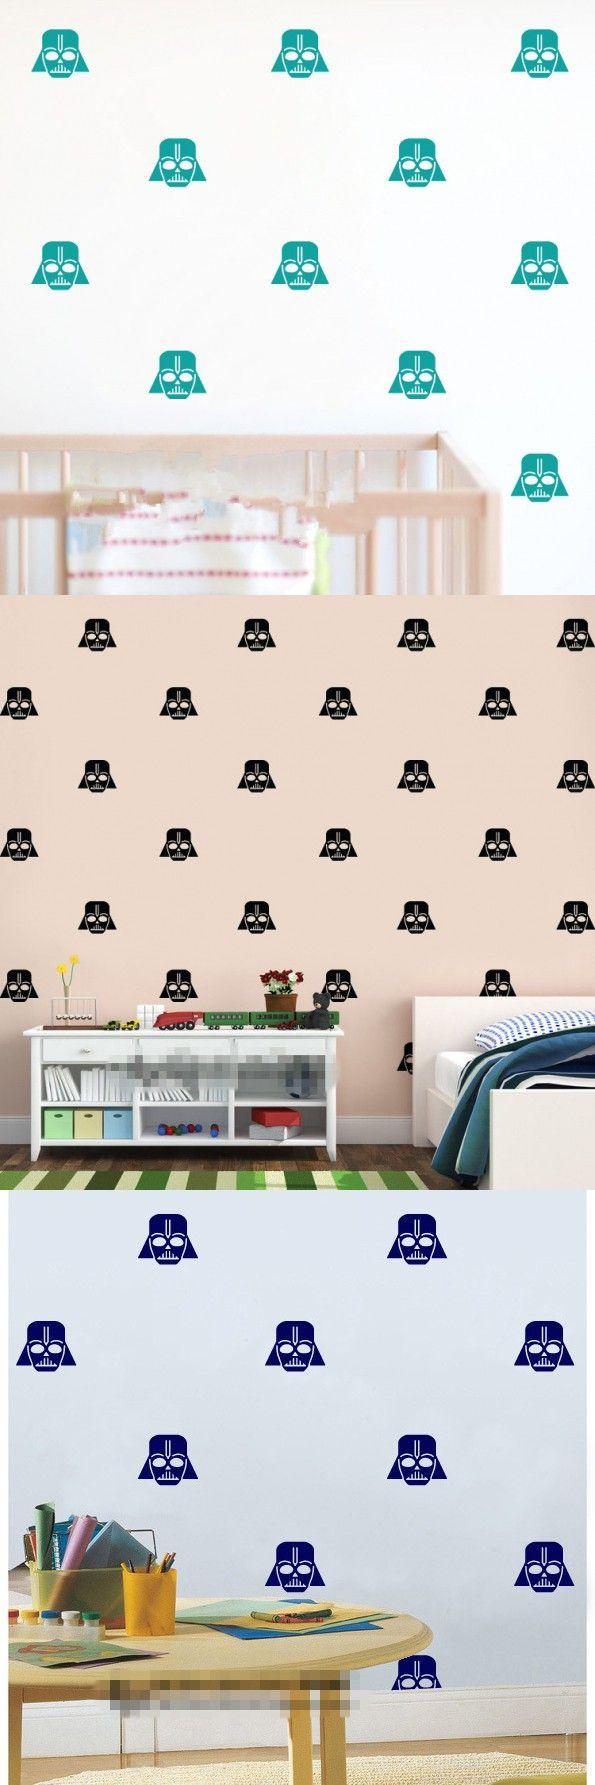 set 40 pcs custom color starwars darth vader kids wall stickers nursery decal home decor art vinyl room wall mural cute kw 250 - Wall Murals For Kids Bedrooms